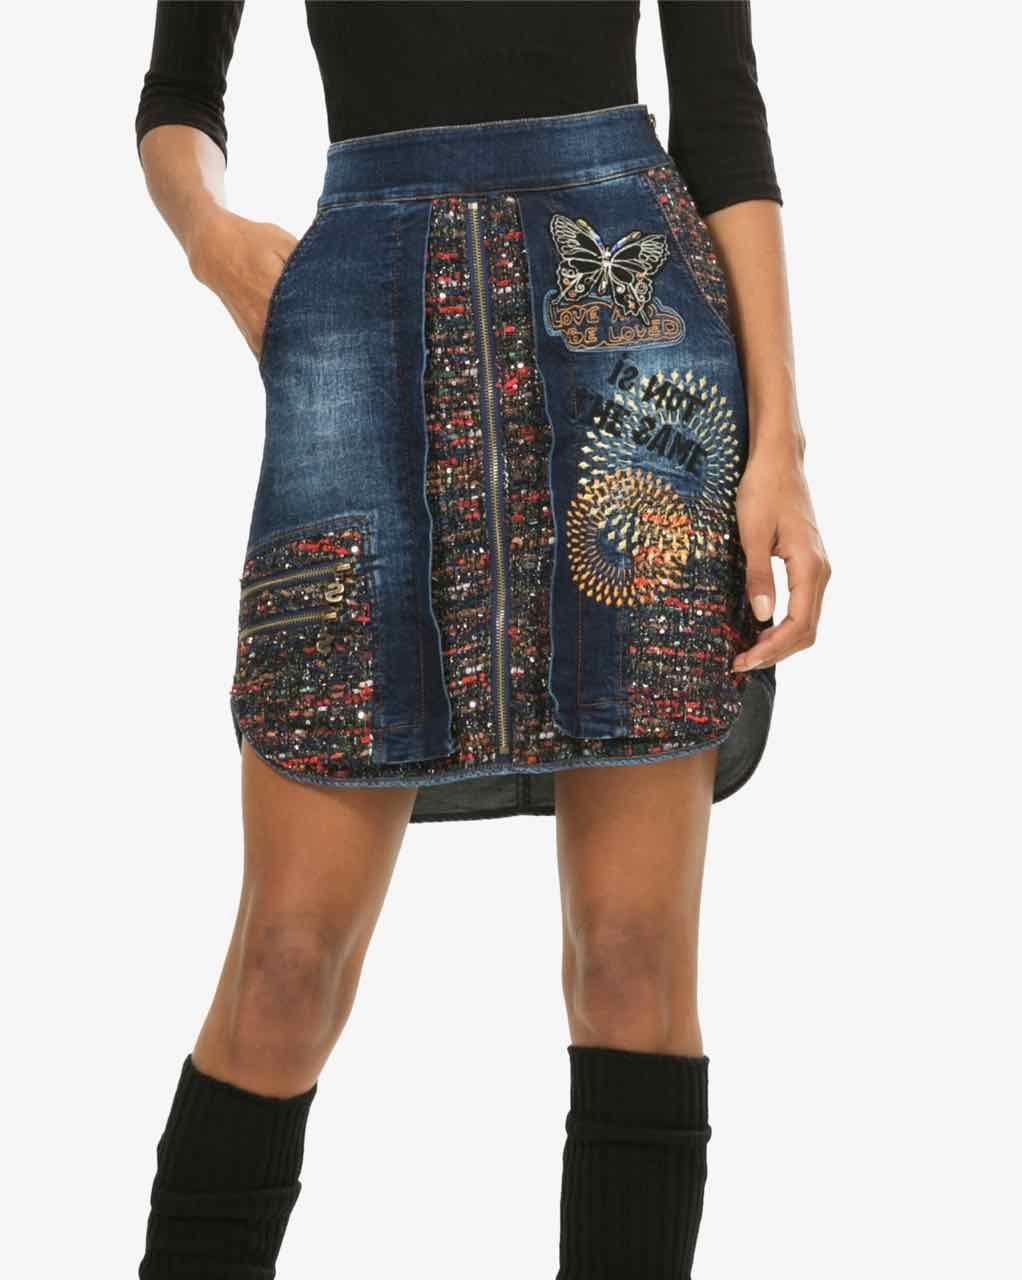 dbf600411 Desigual Denim Skirt Natalia, Buy Online | Desigual favorite in 2019 ...